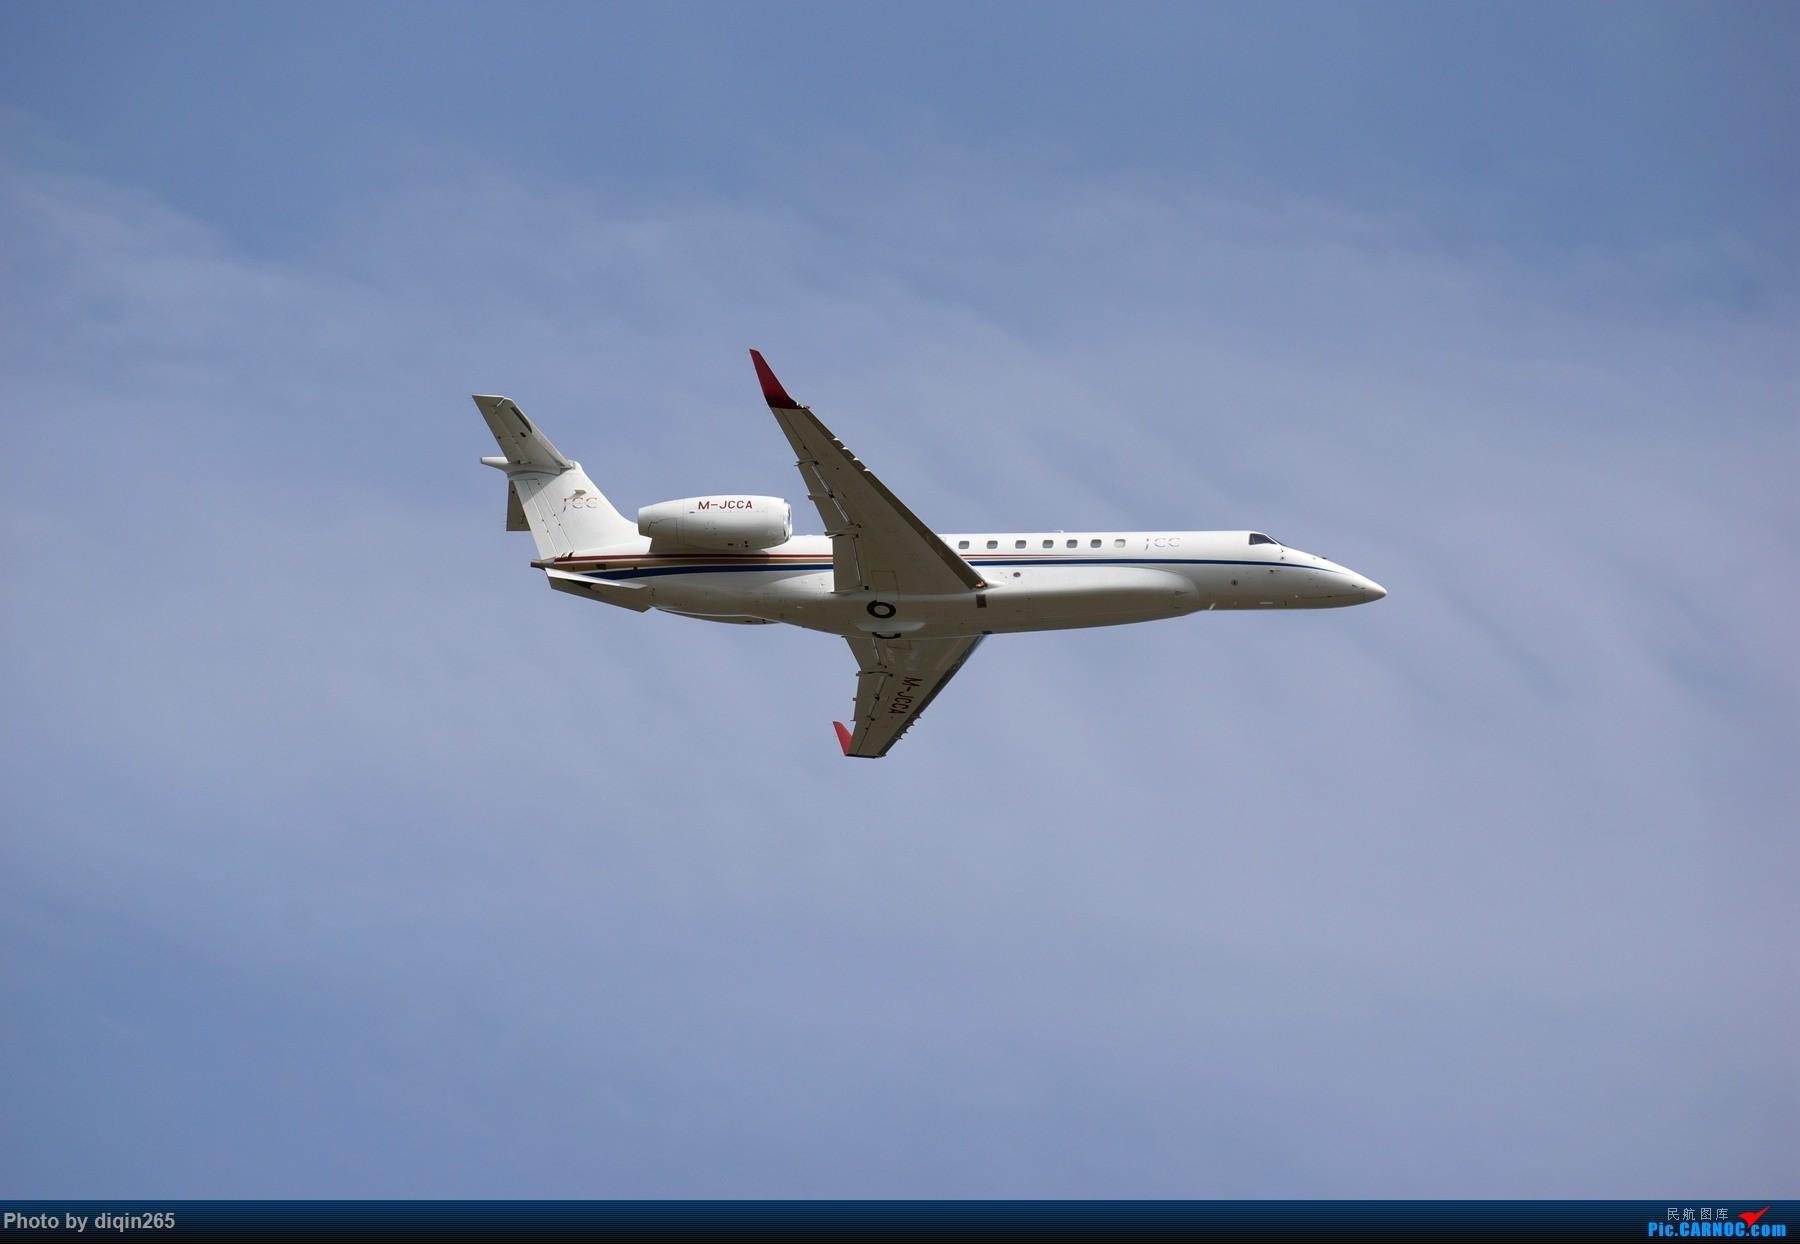 Re:[原创]CTU四月的一个周六 EMBRAER LEGACY 650 M-JCCA 中国成都双流国际机场